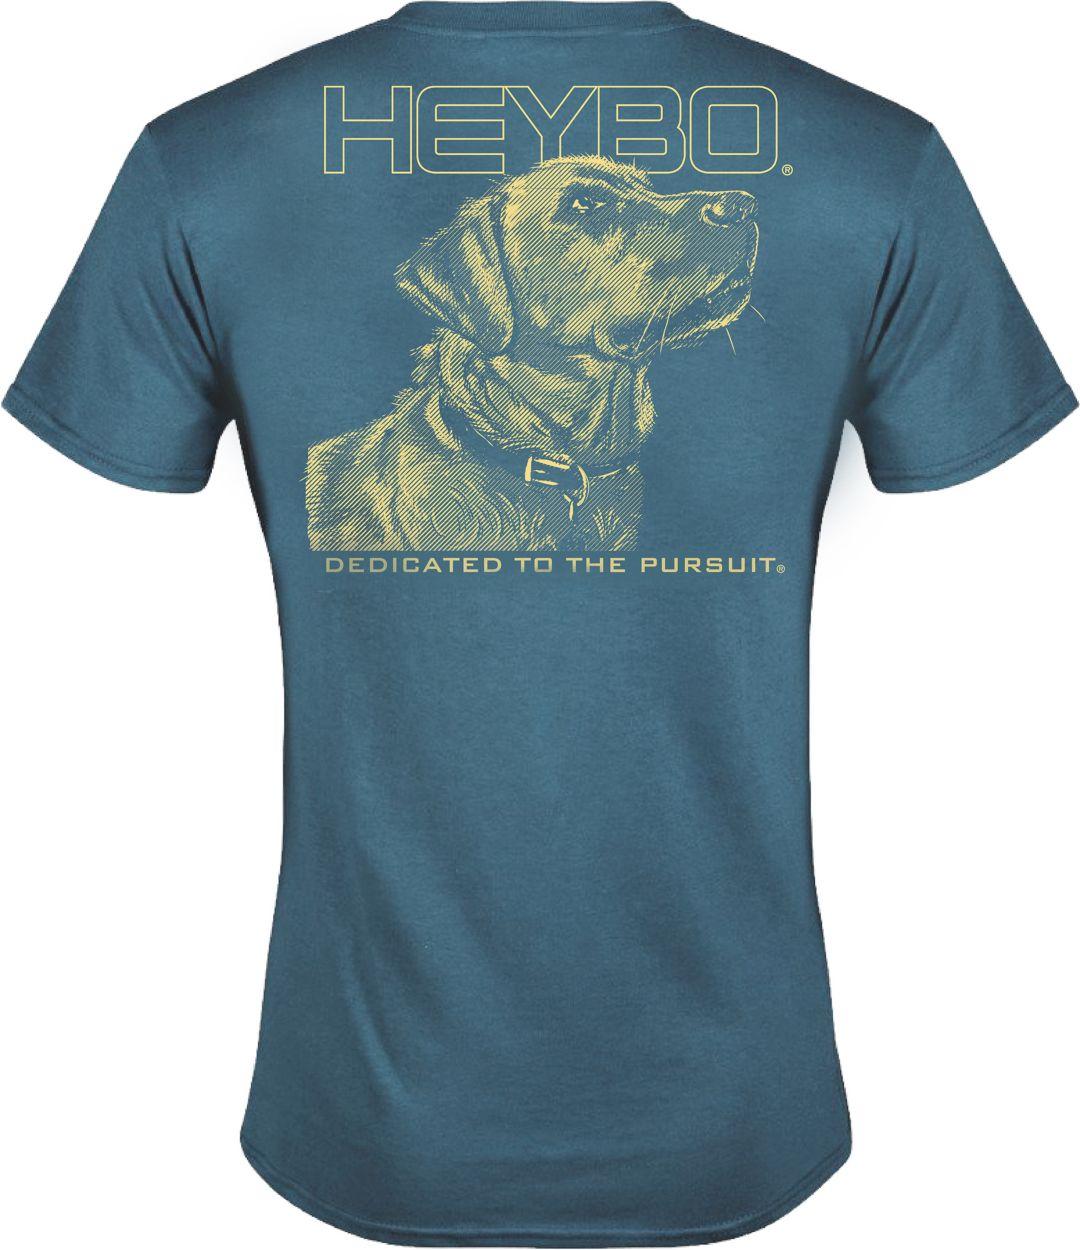 a047c9dea Heybo Men's Looking Up T-Shirt | Field & Stream